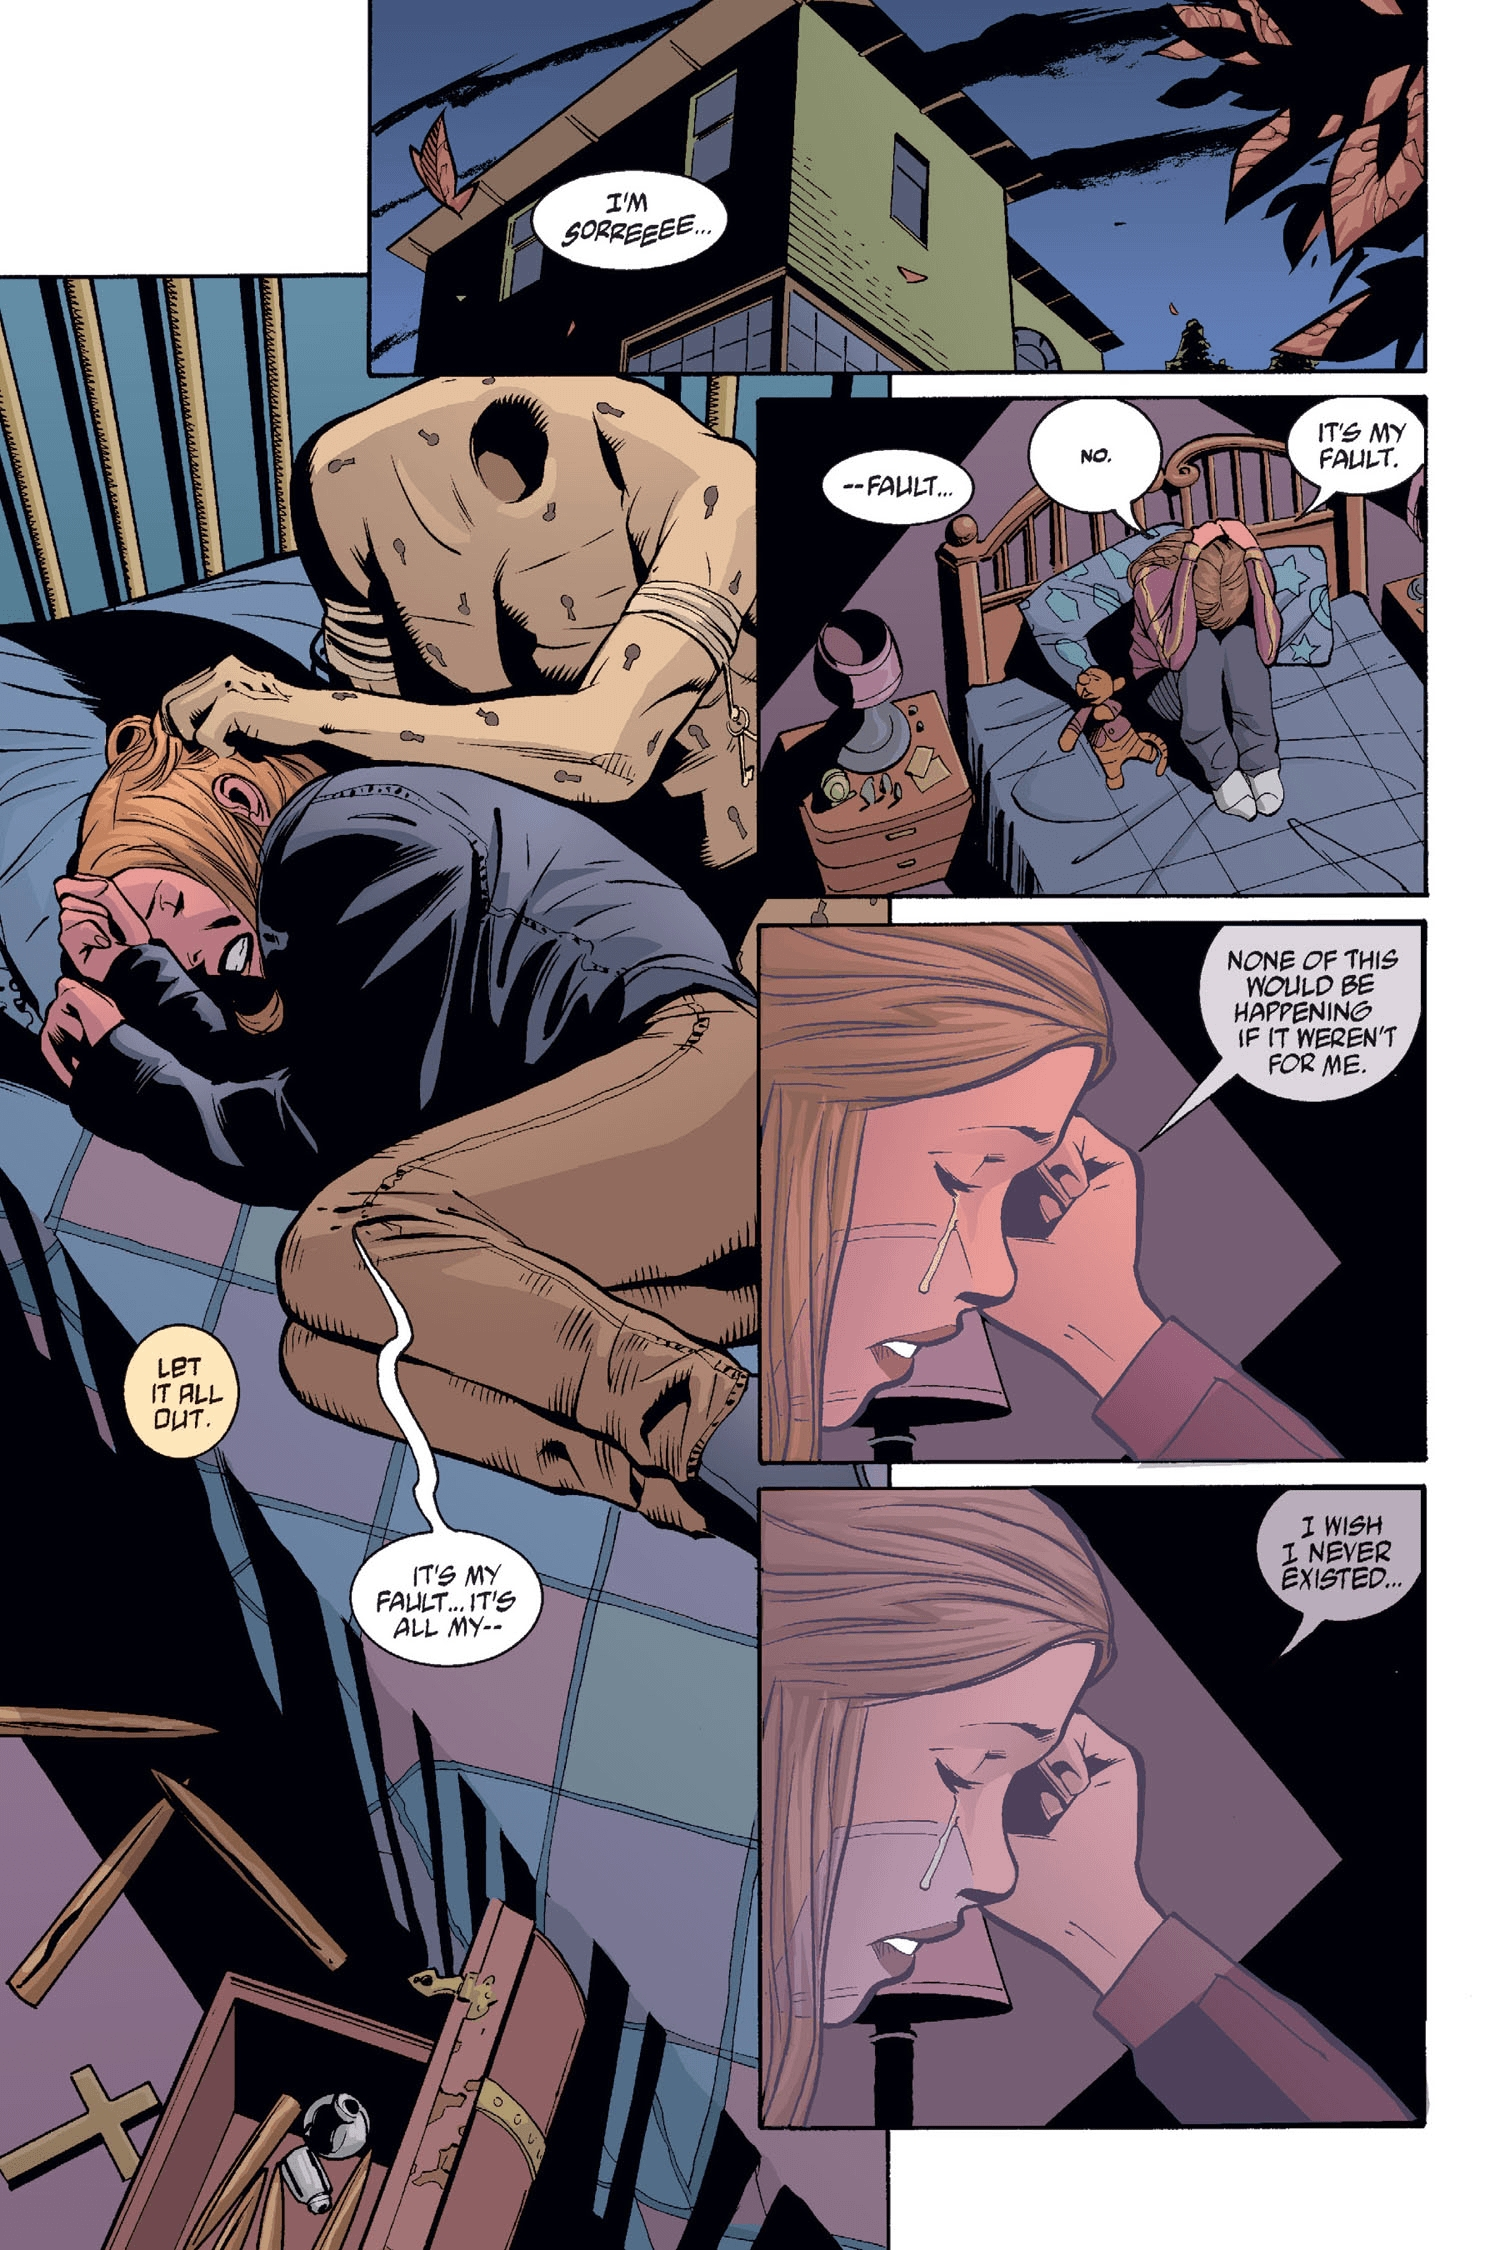 Read online Buffy the Vampire Slayer: Omnibus comic -  Issue # TPB 2 - 50